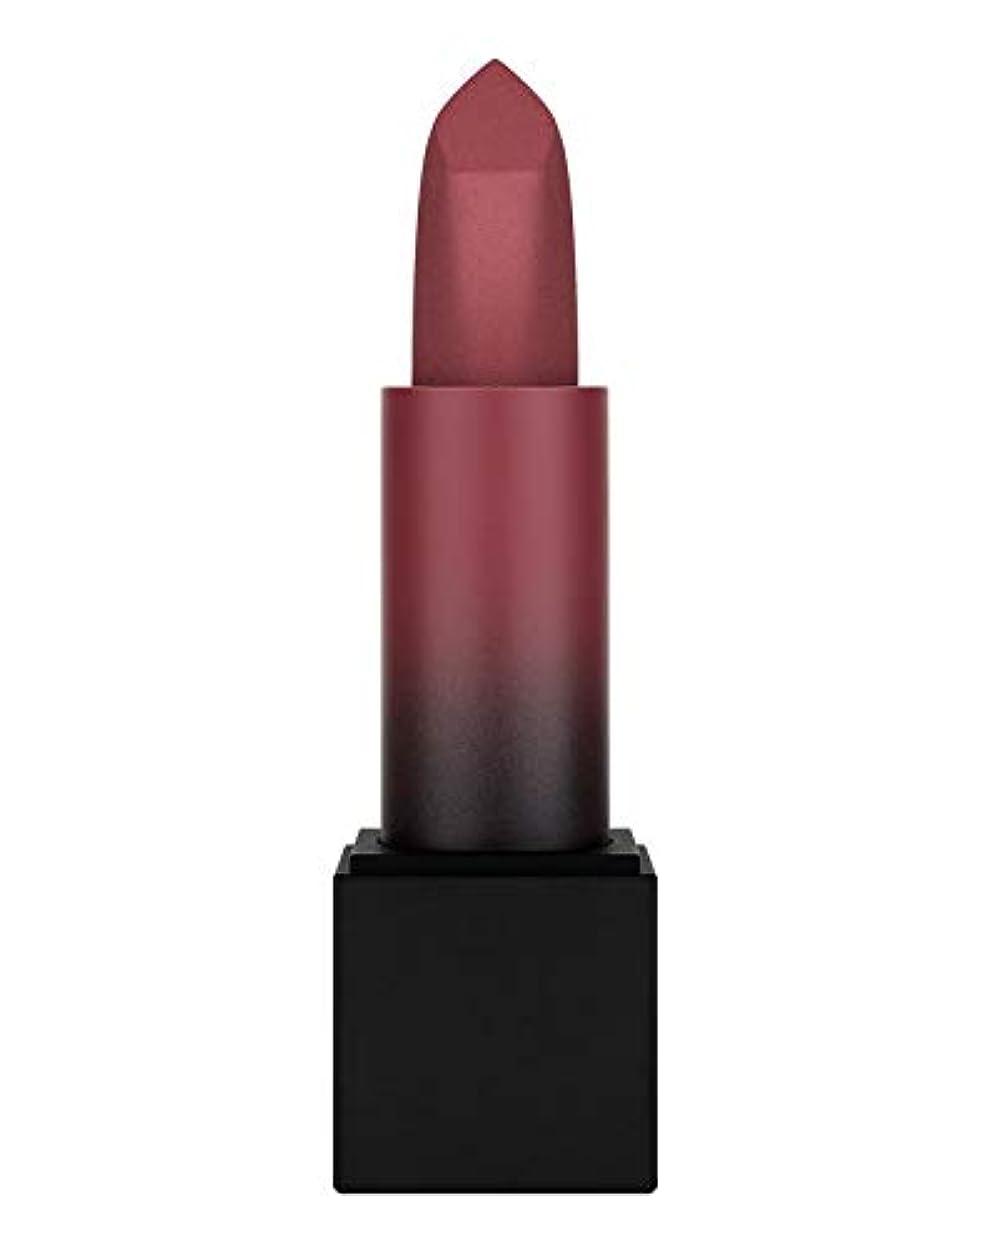 Huda Beauty Power Bullet Matte Lipstick Pool Party フーダ ビューティー マットリップ プールパーティ